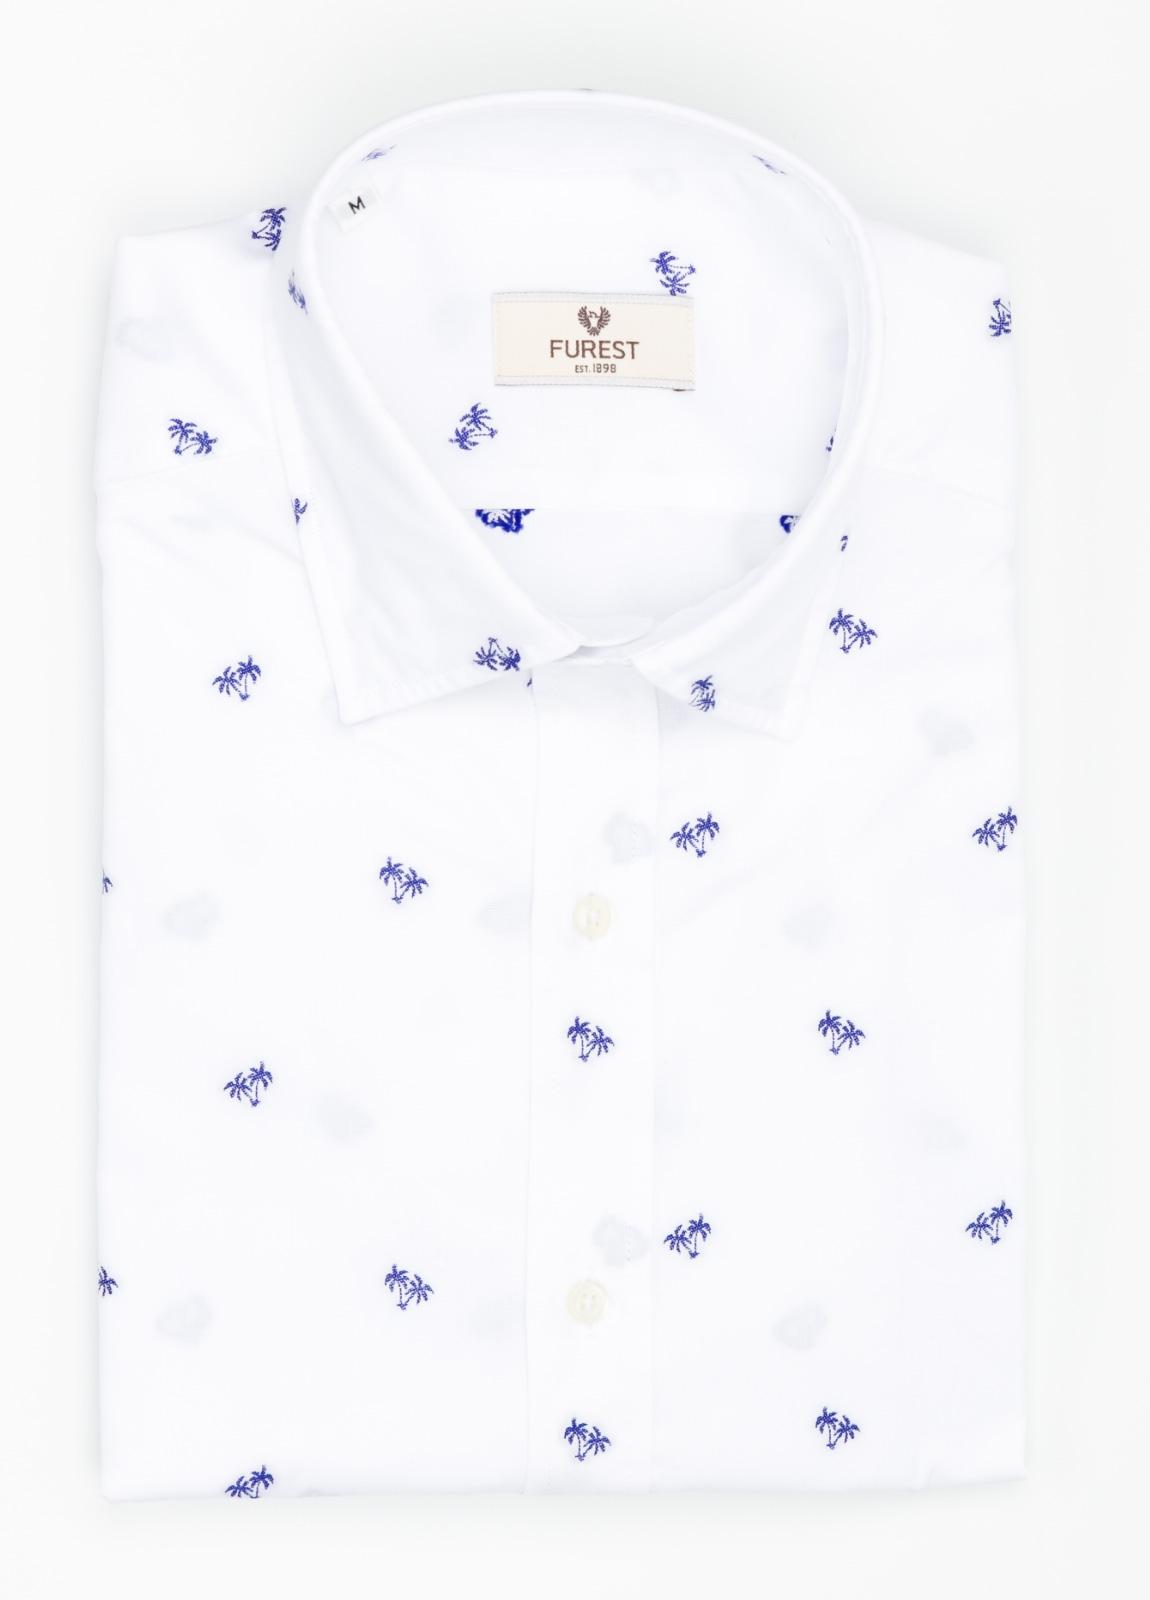 Camisa Leisure Wear SLIM FIT modelo PORTO color blanco estampado fantasia. 100% Algodón.